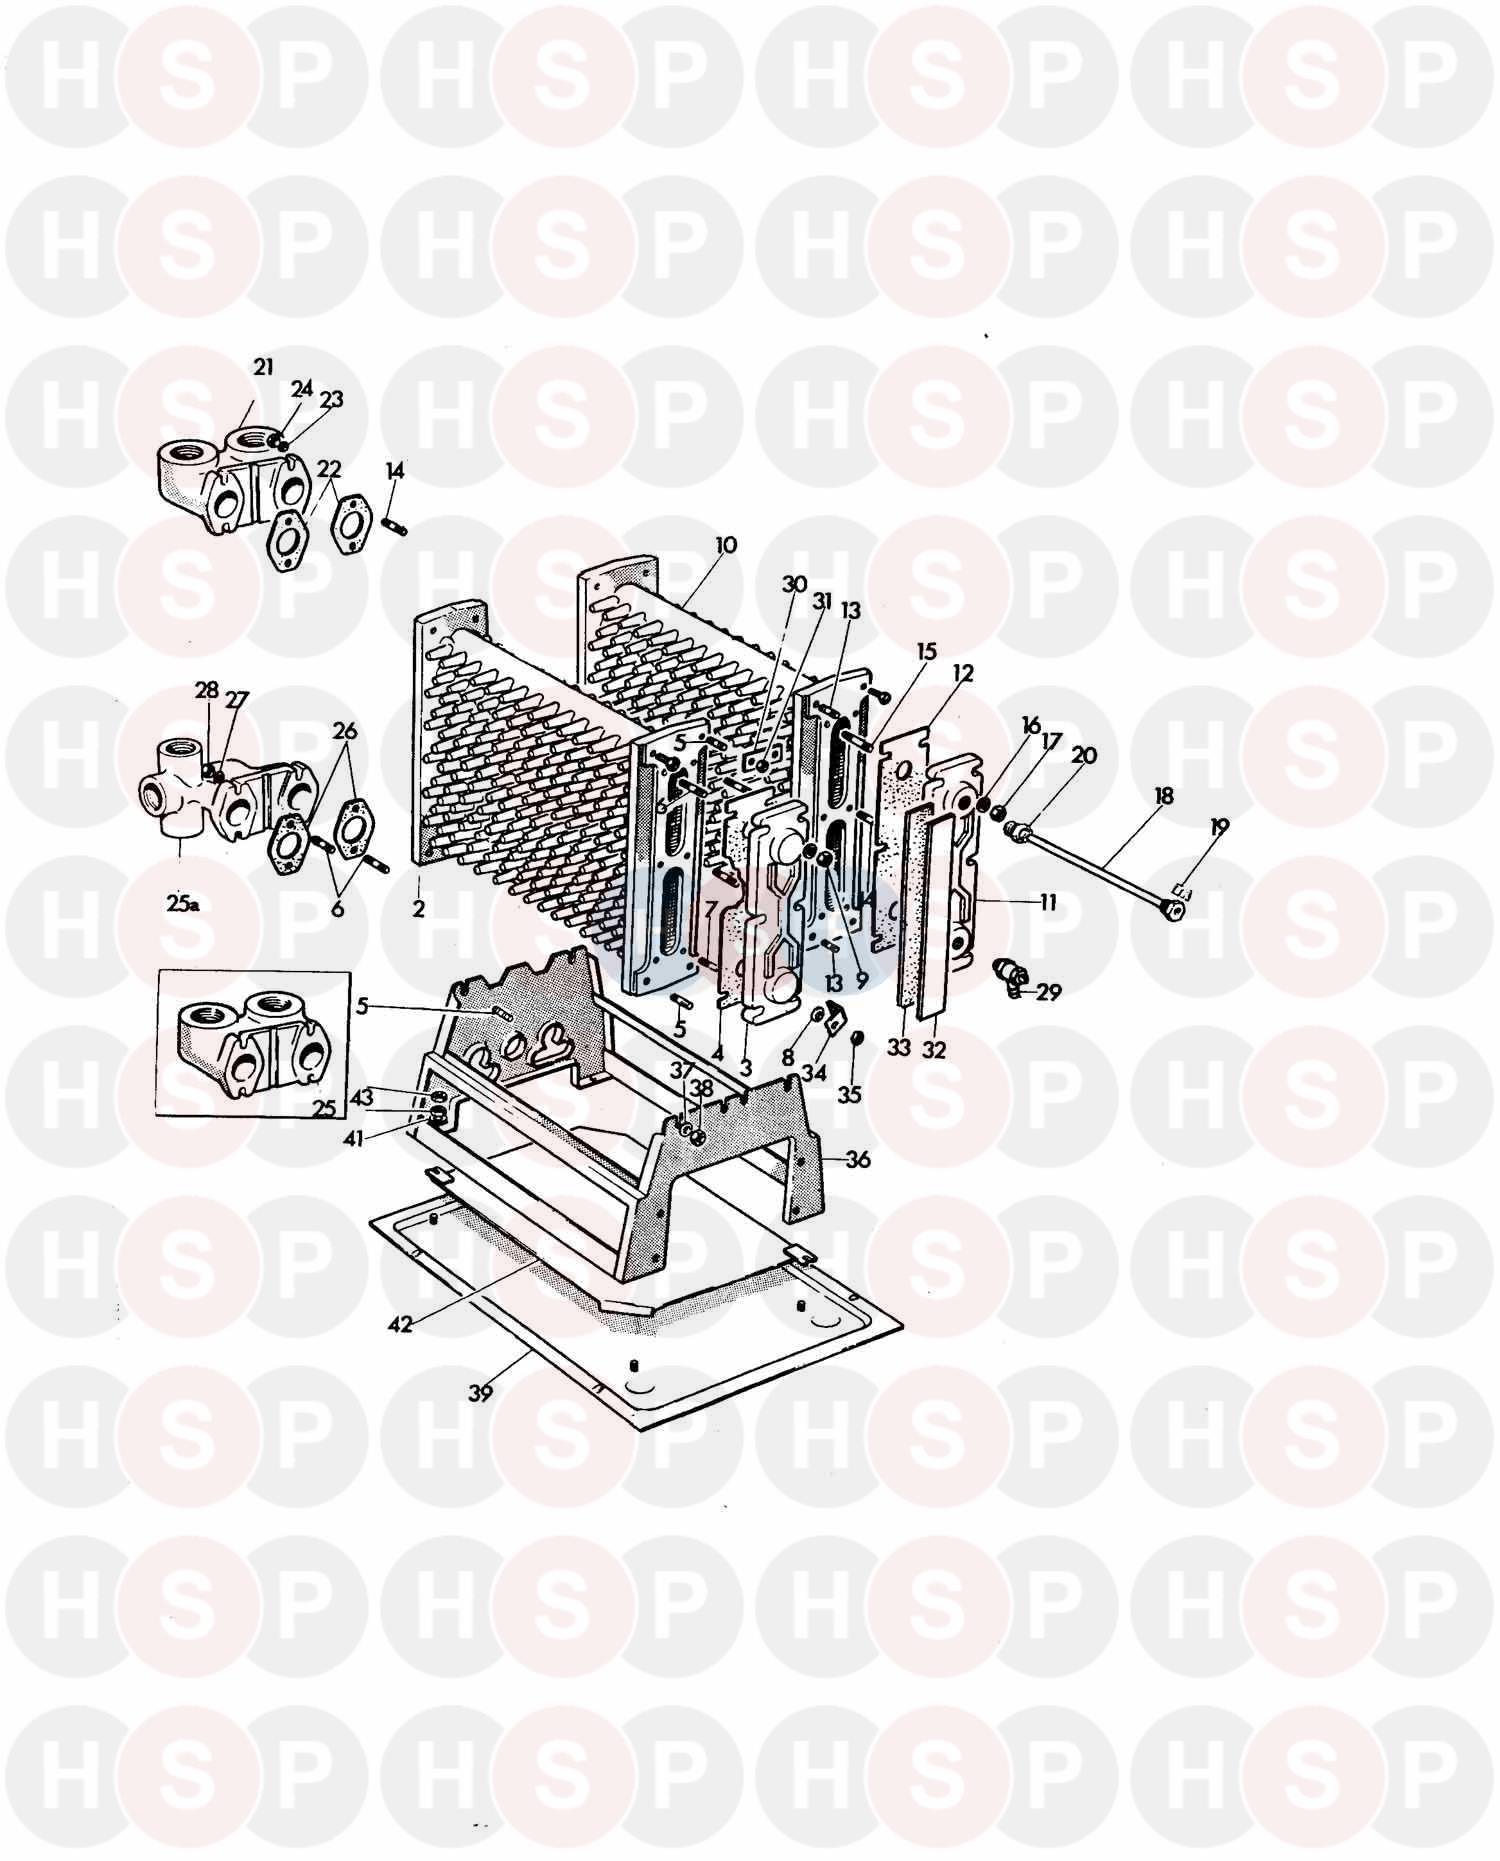 Spark Plug Wire Diagram Tryitme Rascal 300 Wiring Fuses Ouku Datajack C80 Rj45 Data Jack Three Imagehandler